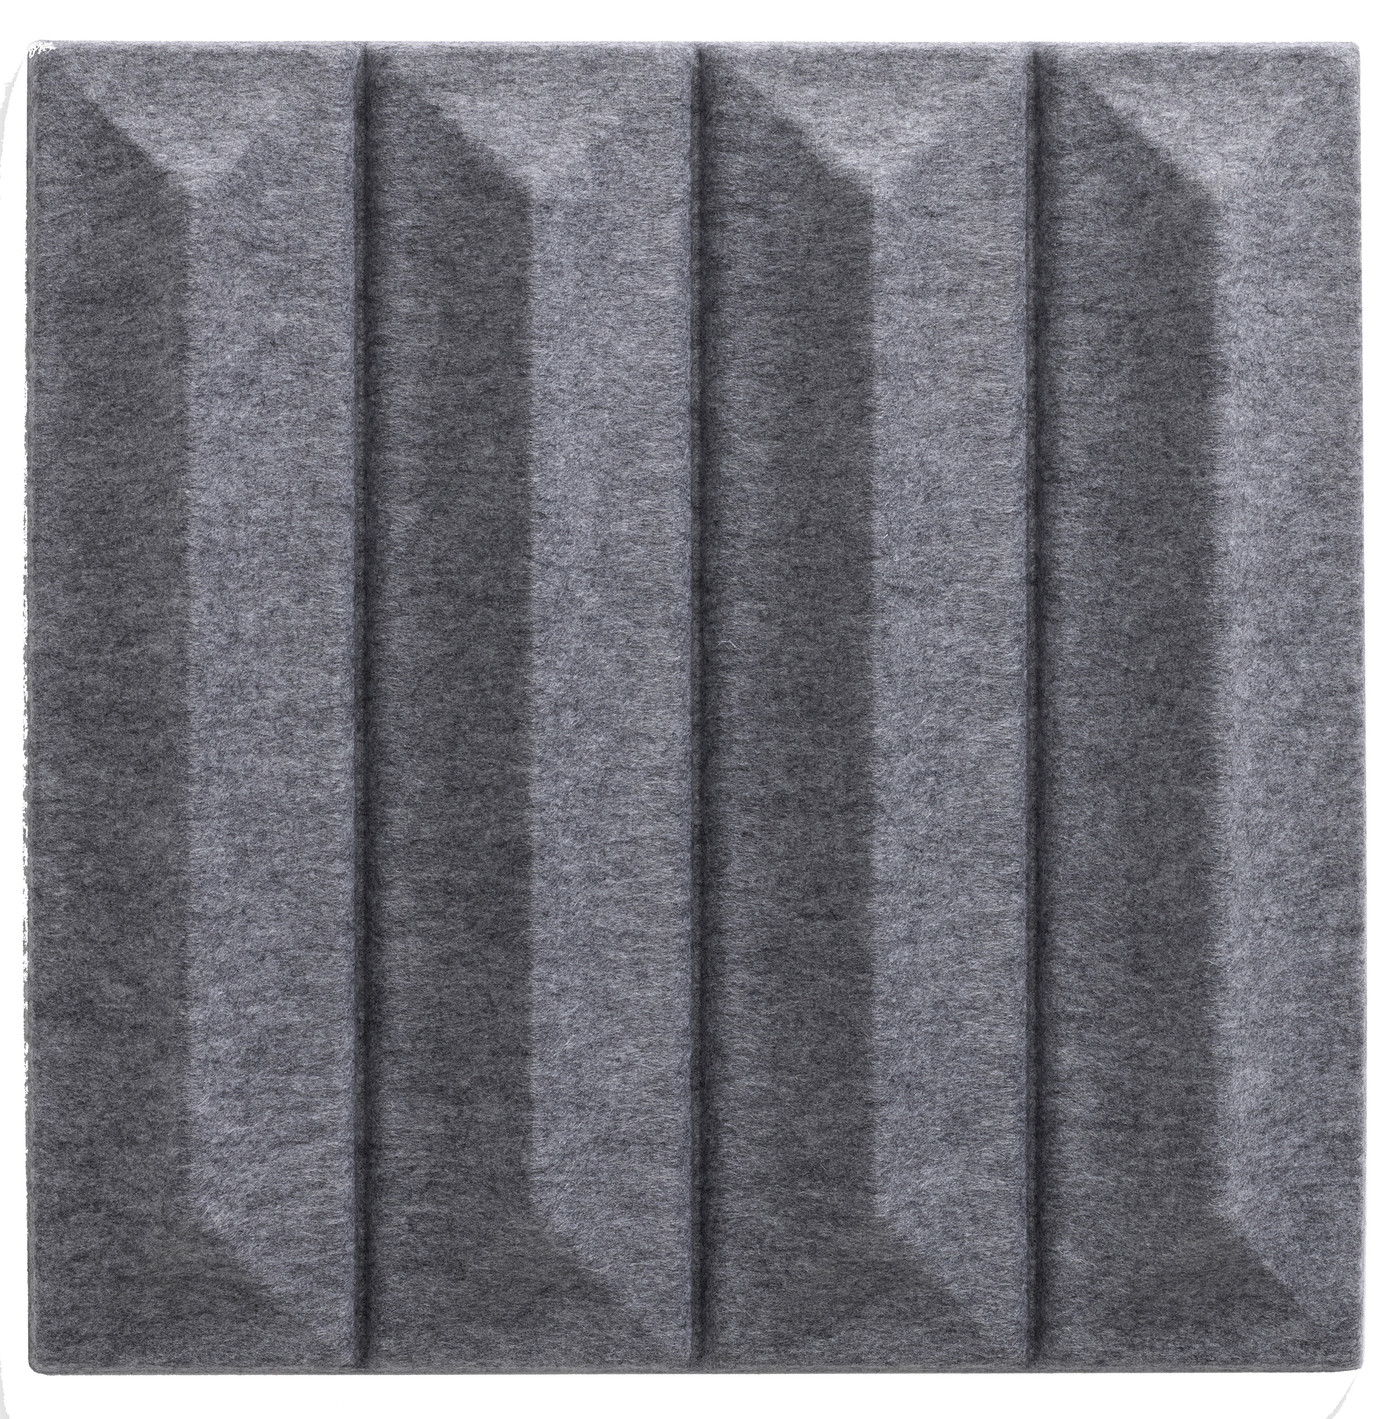 0-Control-Sonido-Paneles-Acusticos-Soundwave-Ceramic-1380